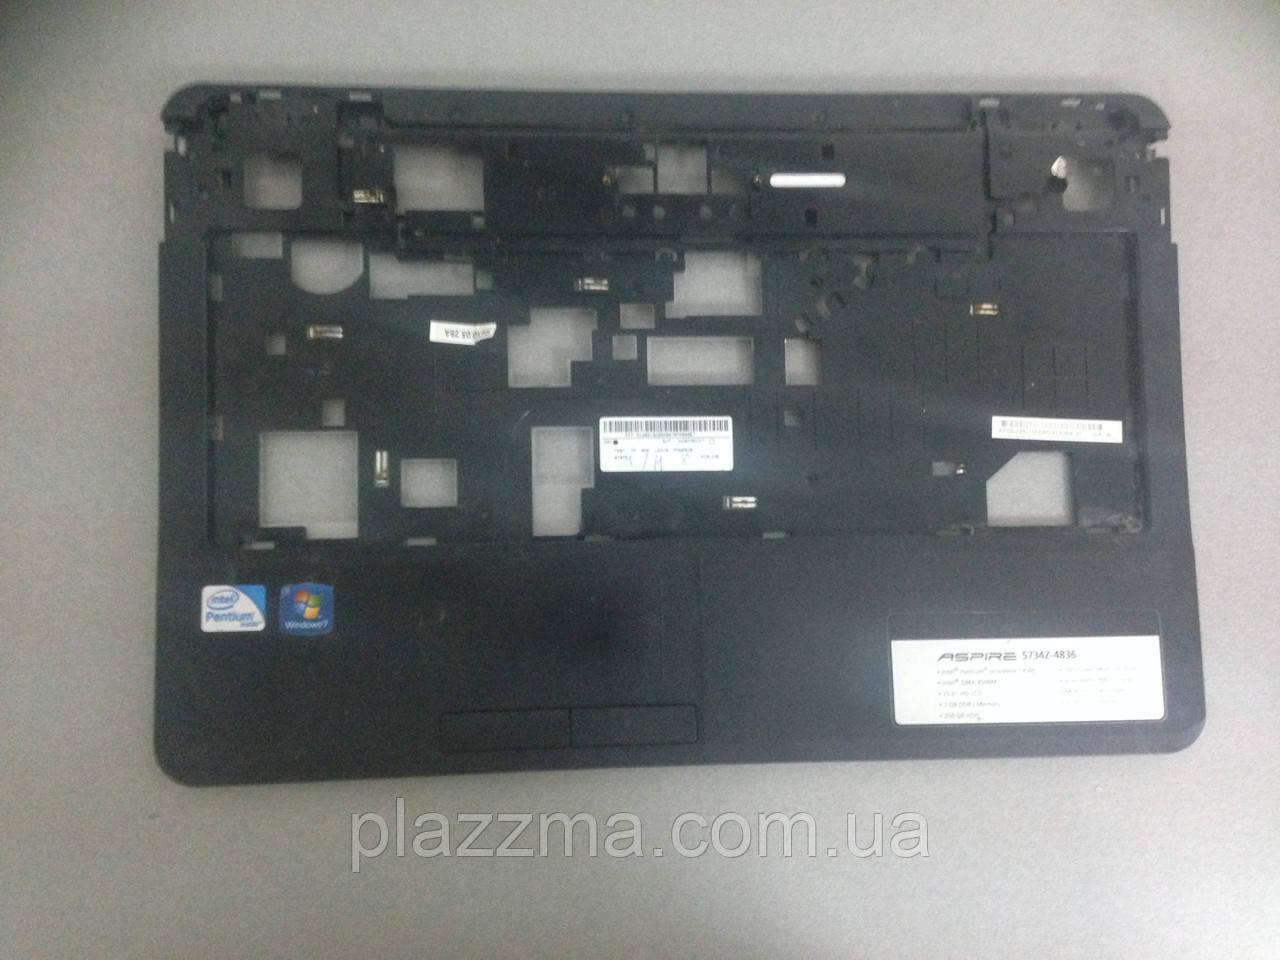 Средняя часть корпуса Acer Aspire 5734Z-4836 б у б/у